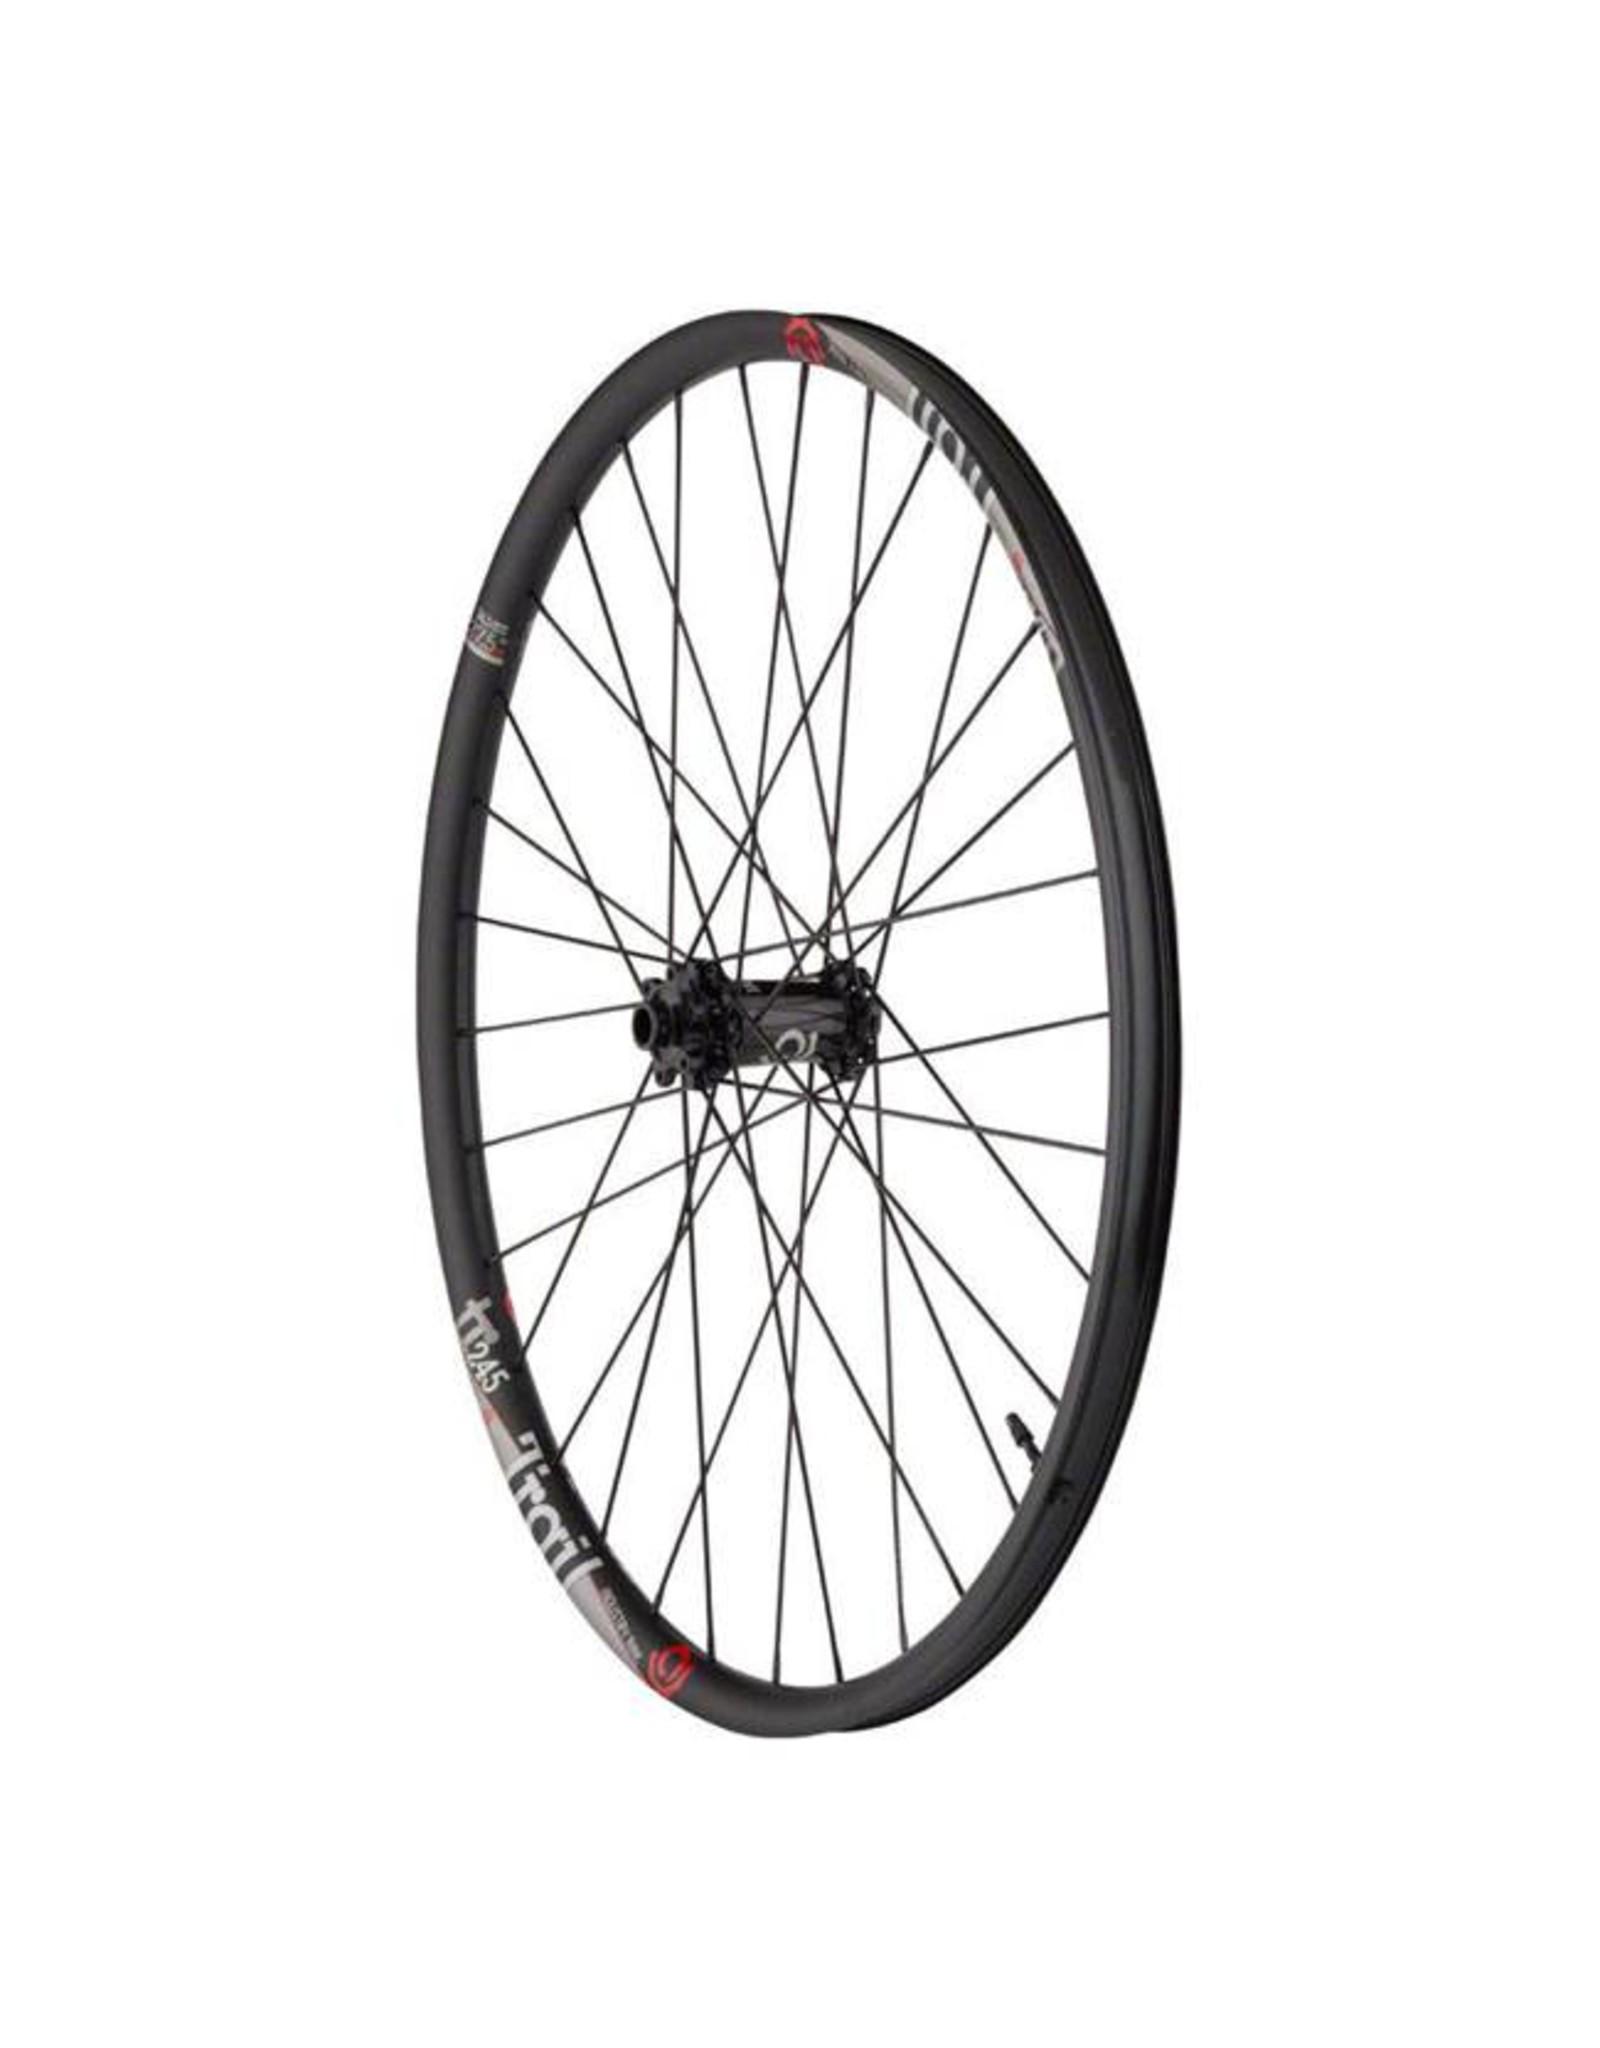 "Industry Nine Industry Nine Trail 245 Wheelset: 27.5"", 15 x 110mm Boost, 12 x 148mm, 32H, Shimano HG Freehub, Black"